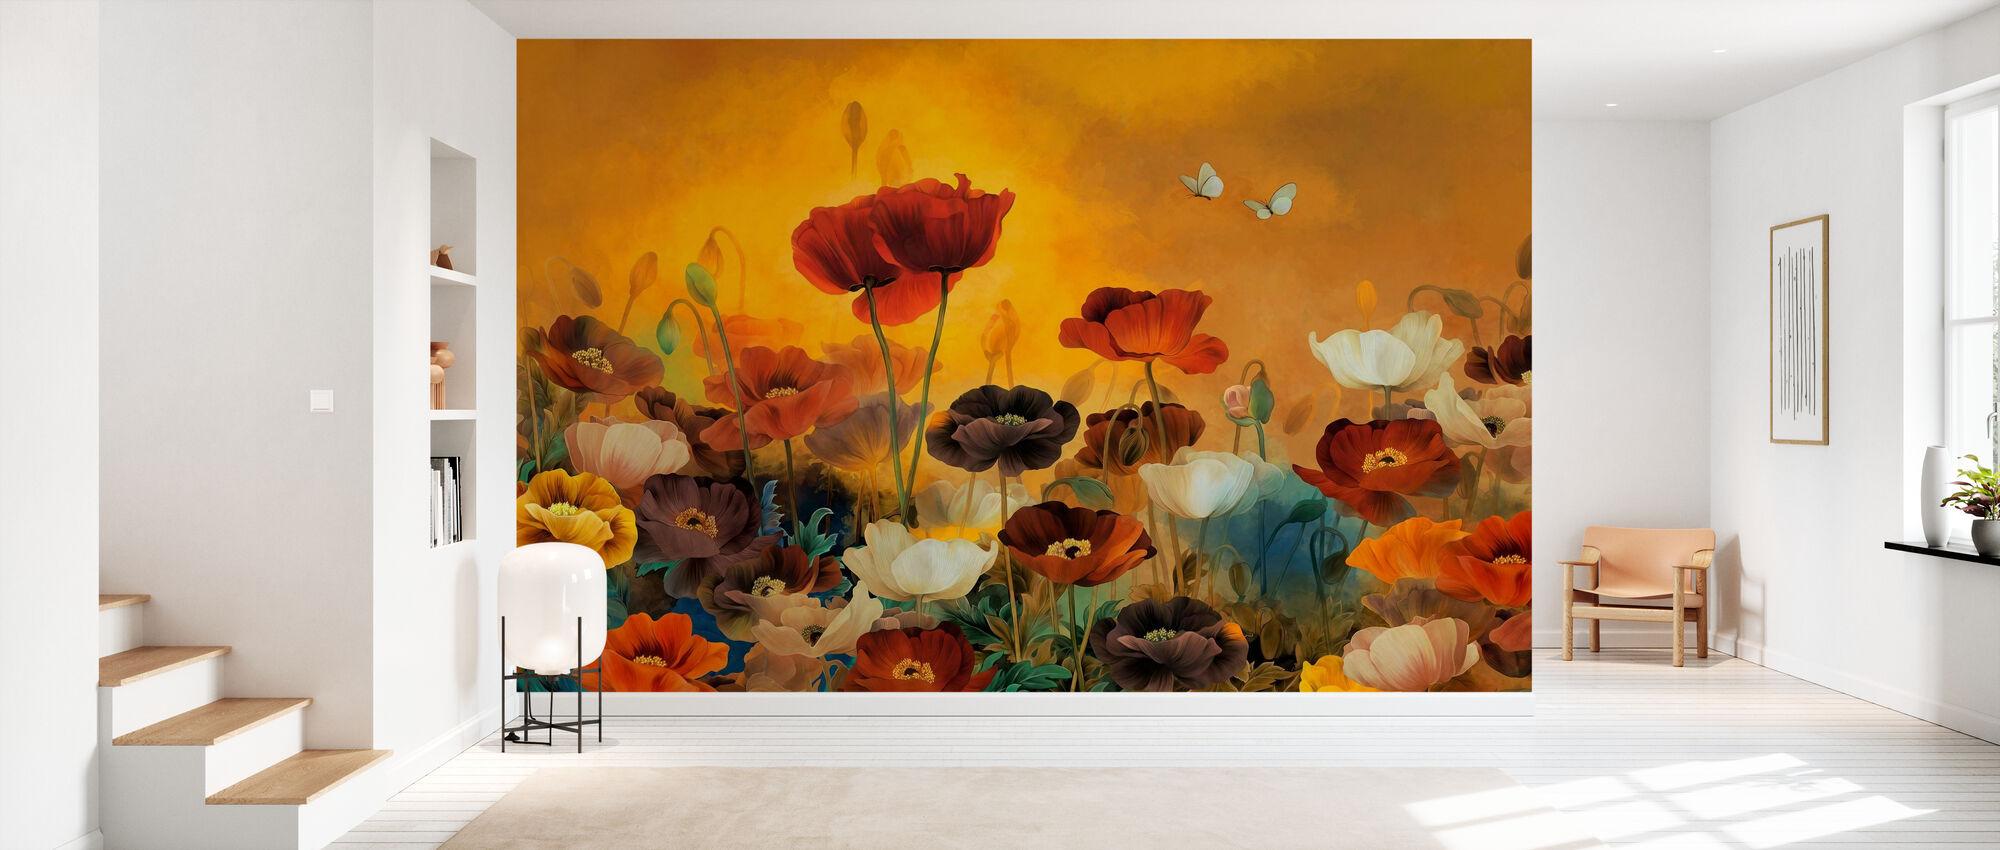 Poppies Poppies - Wallpaper - Hallway